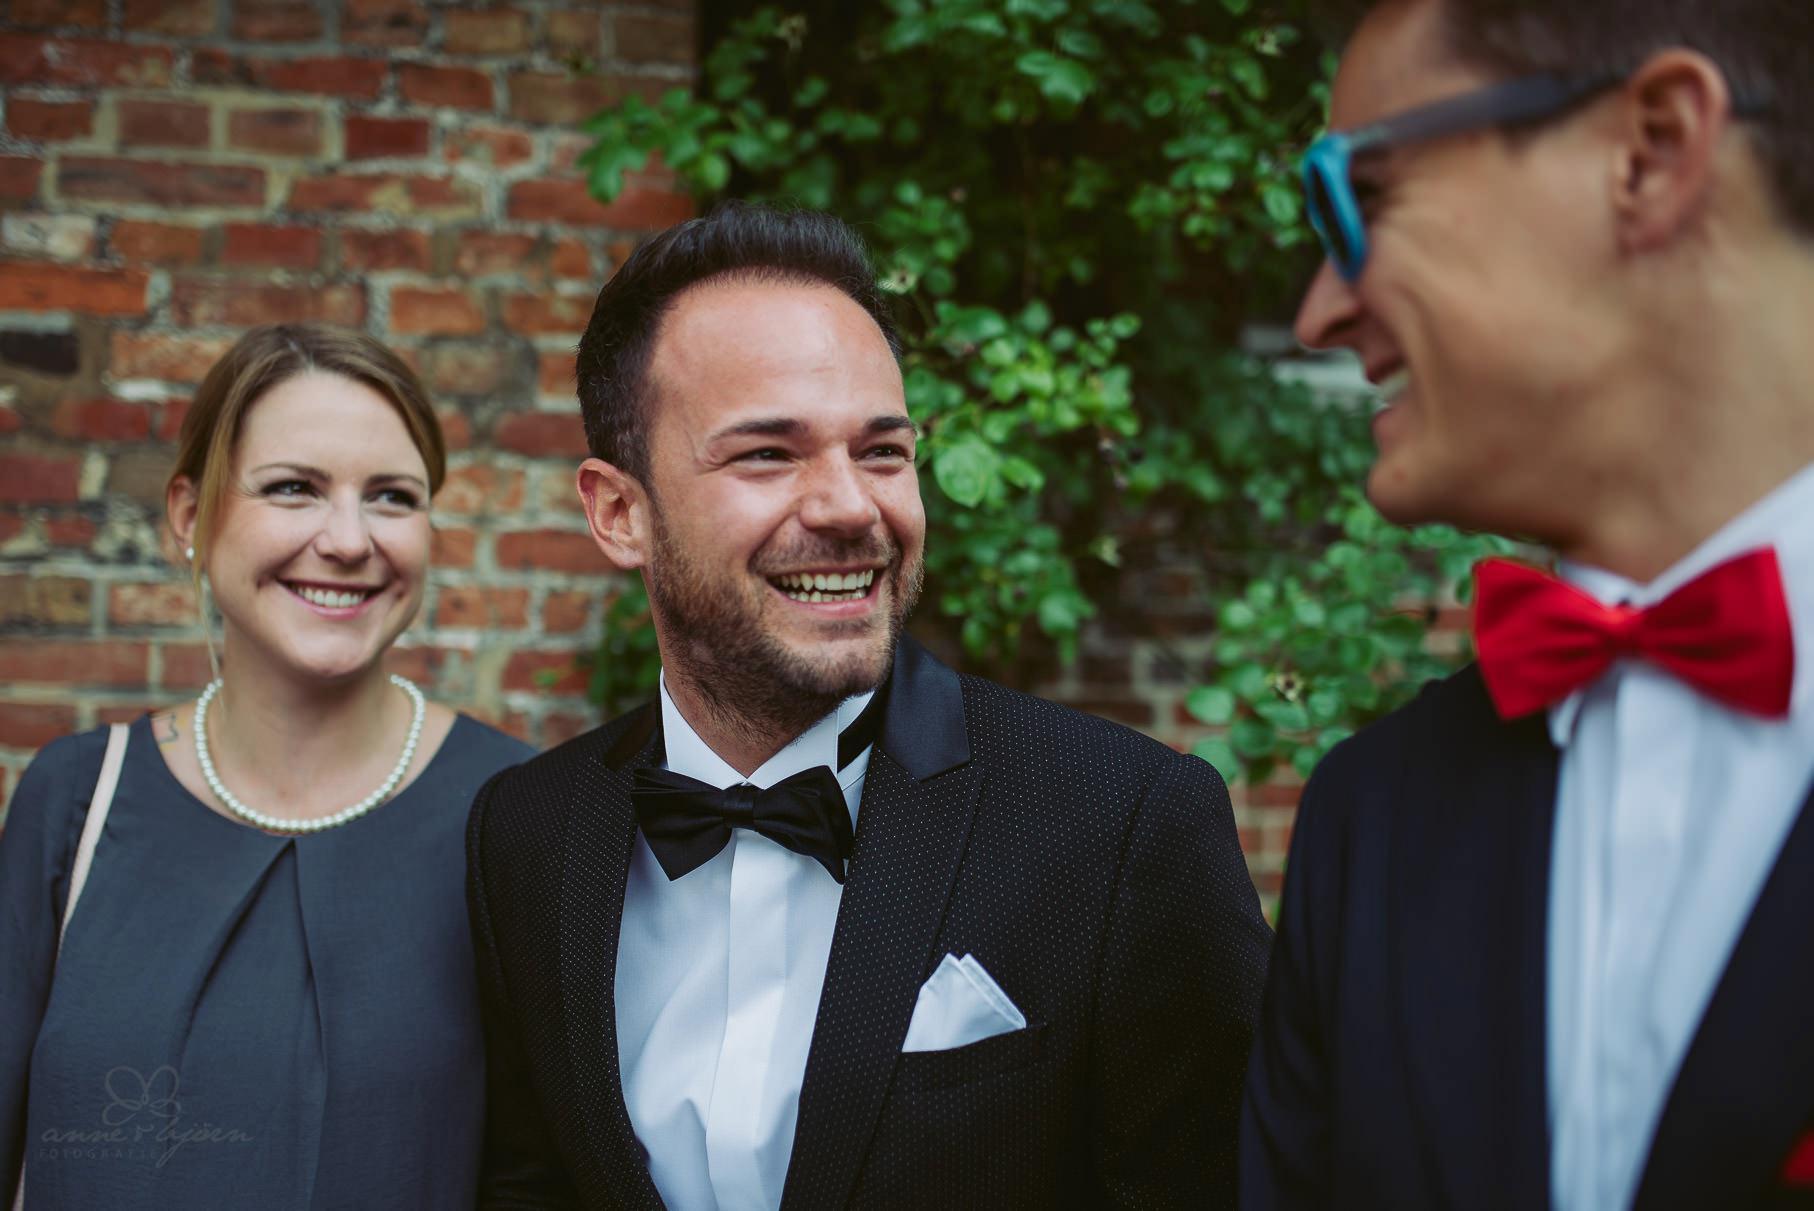 0044 aud blog 811 0238 - Hochzeit an der Hamburger Elbe - Ann-Katrin & Daniel